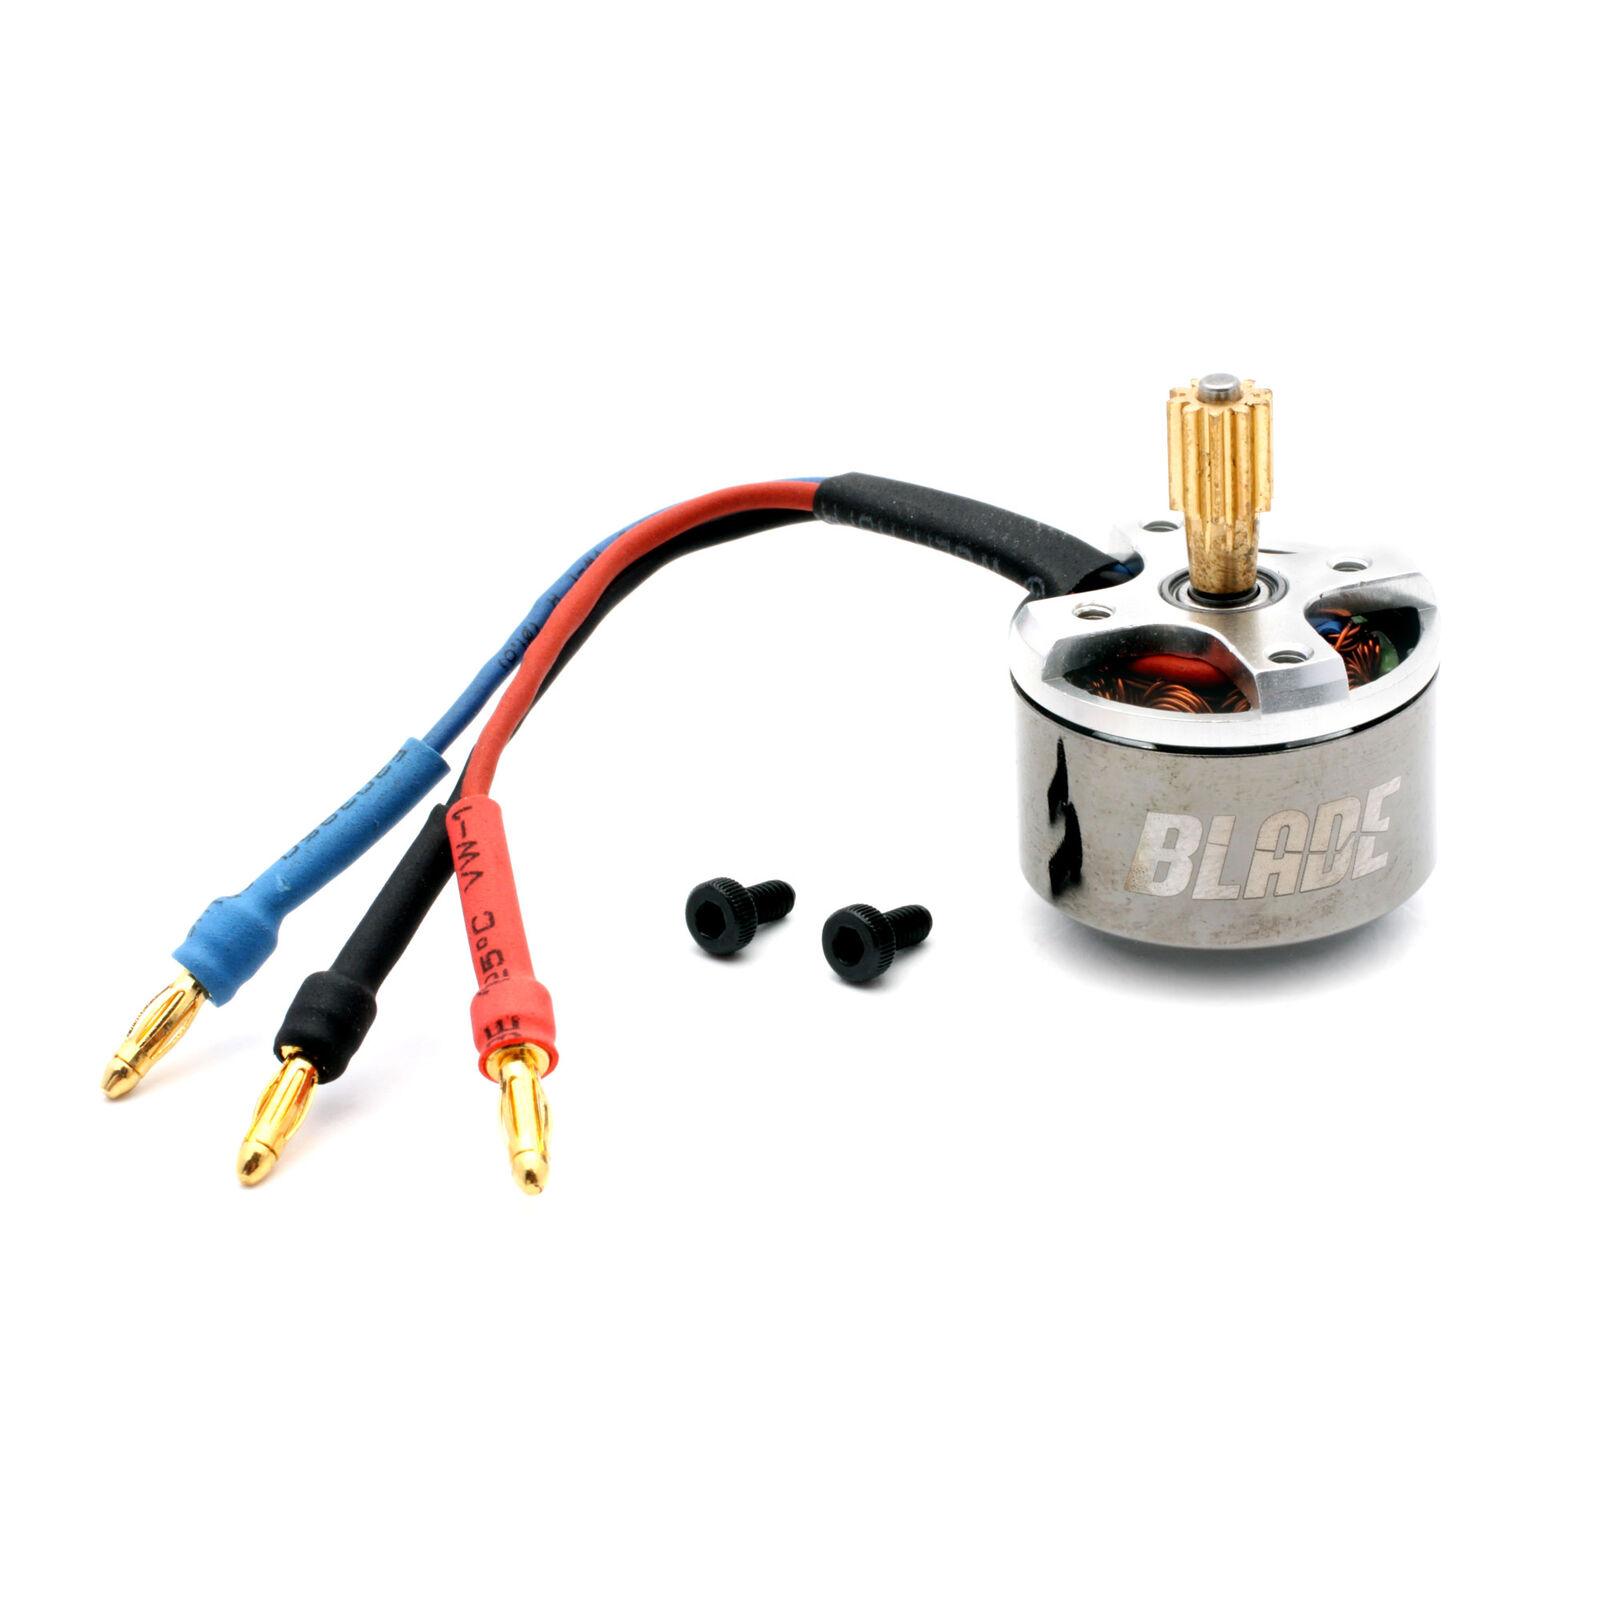 Brushless Main Motor: 180 CFX, 150 S